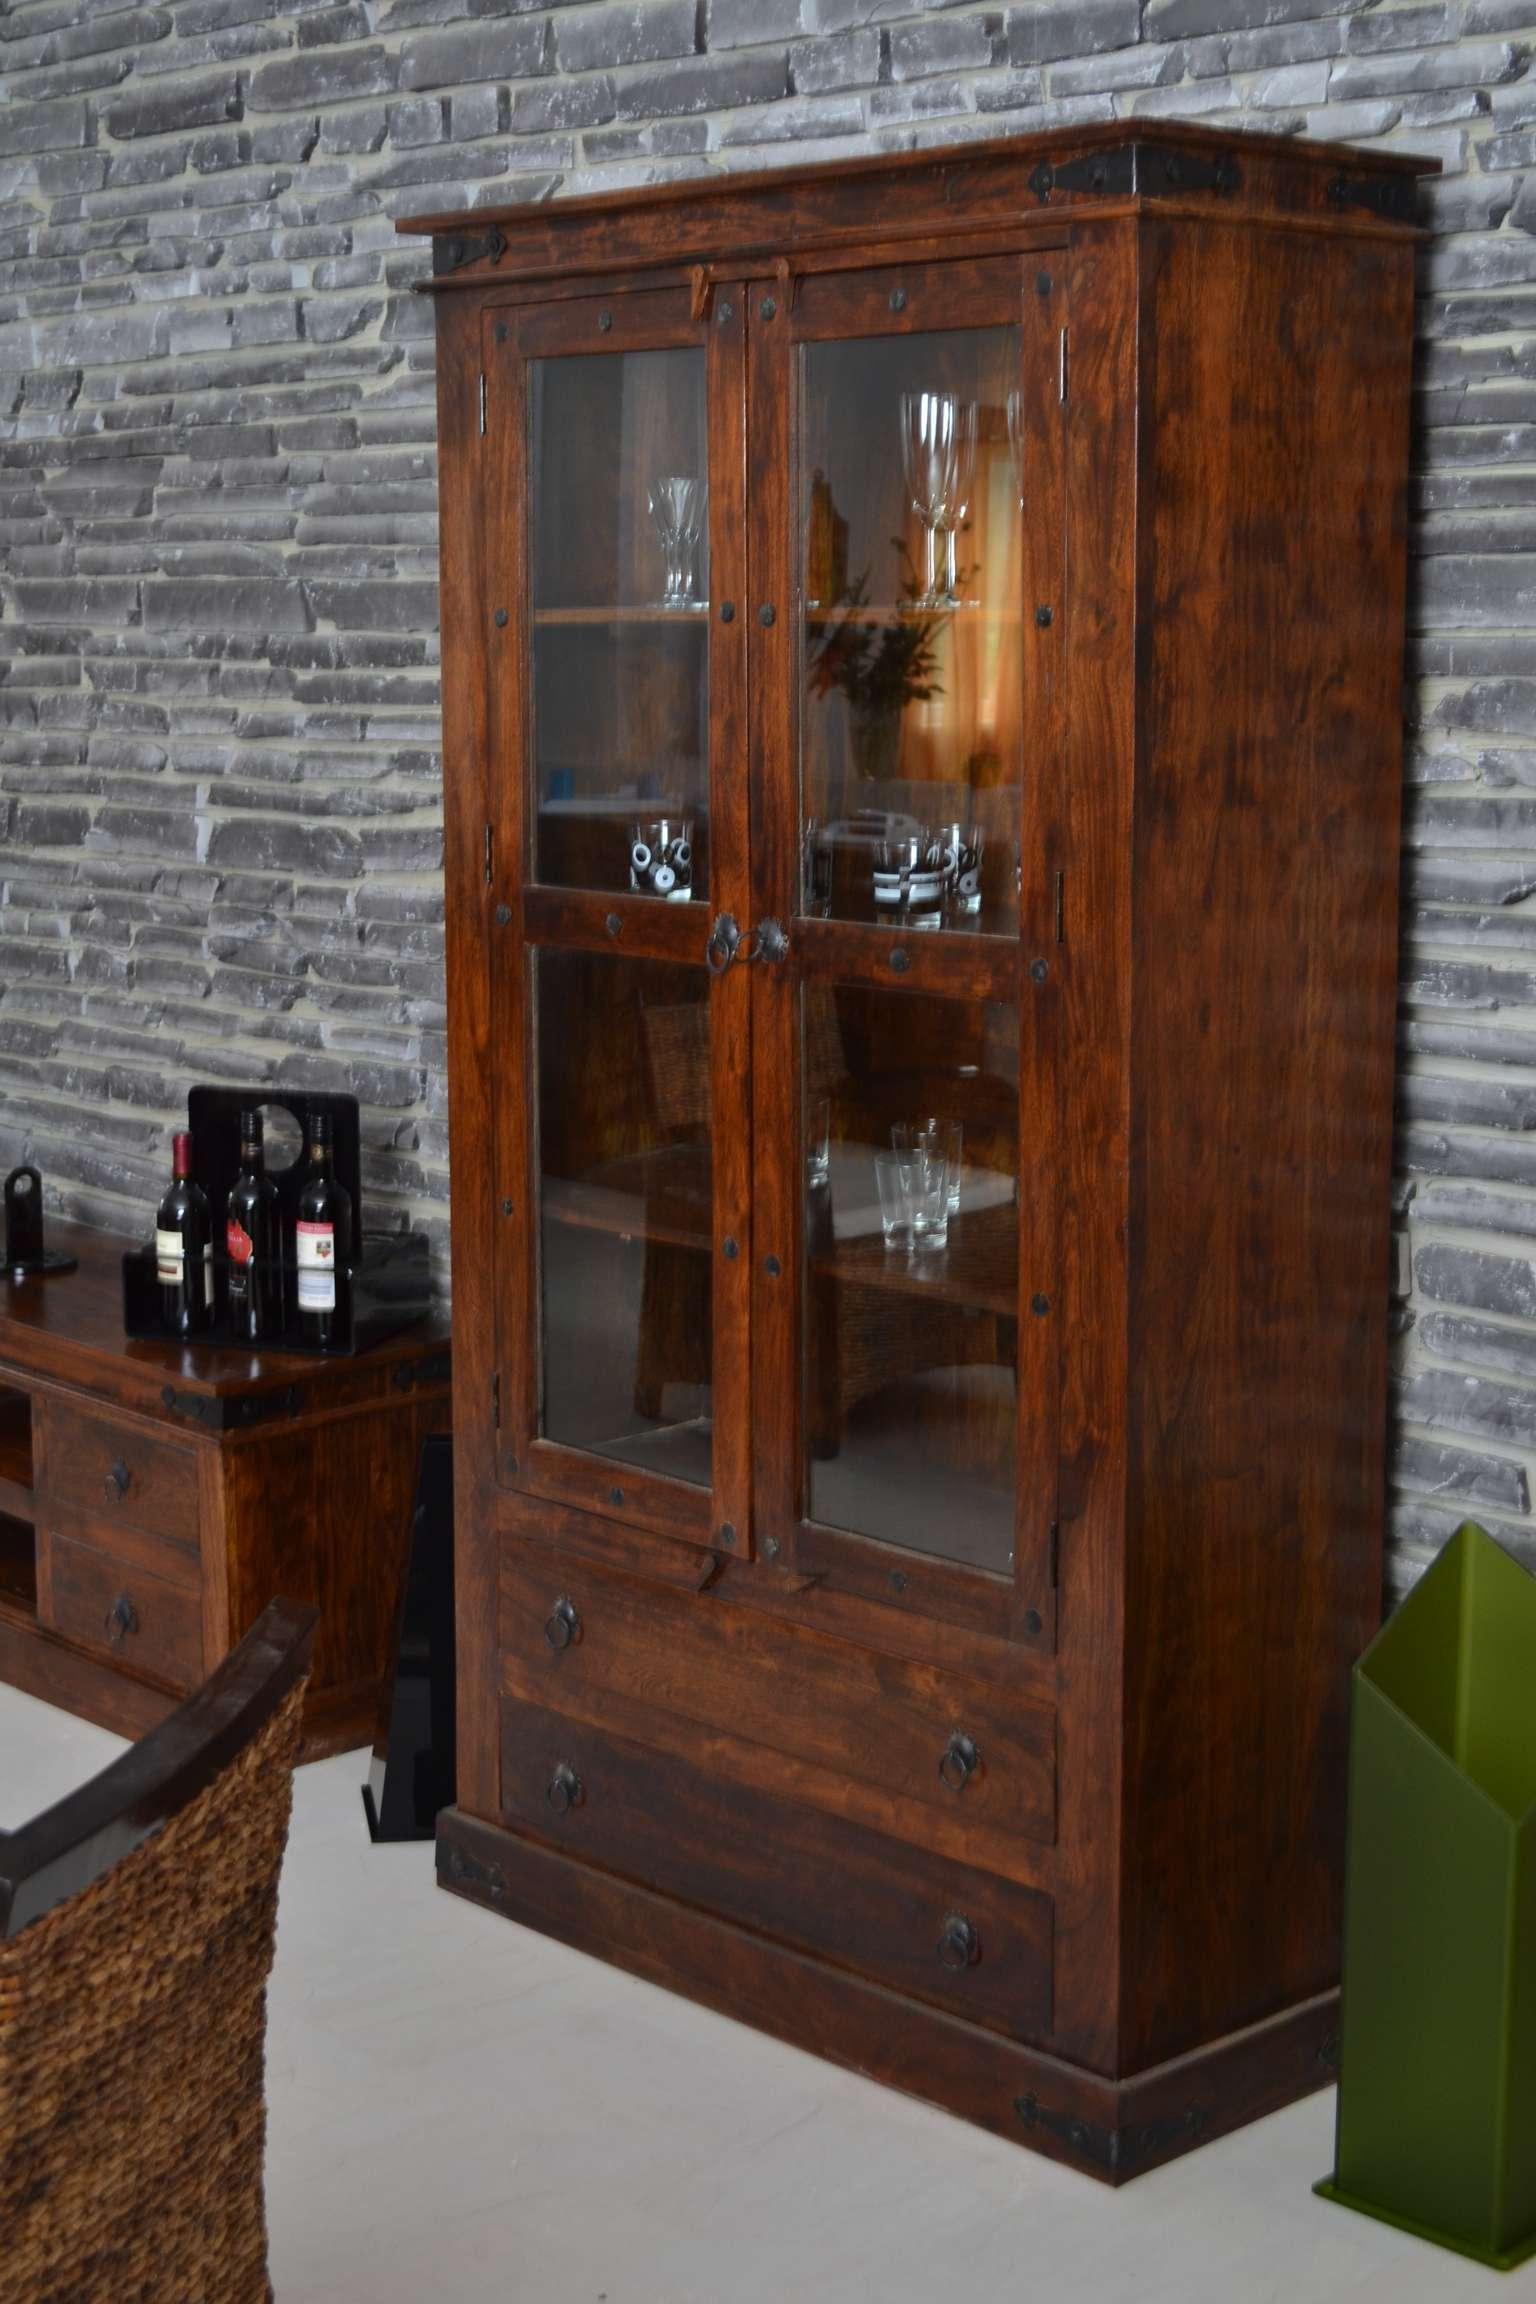 vitrine colombo massivholz m bel akazie walnuss 20530. Black Bedroom Furniture Sets. Home Design Ideas